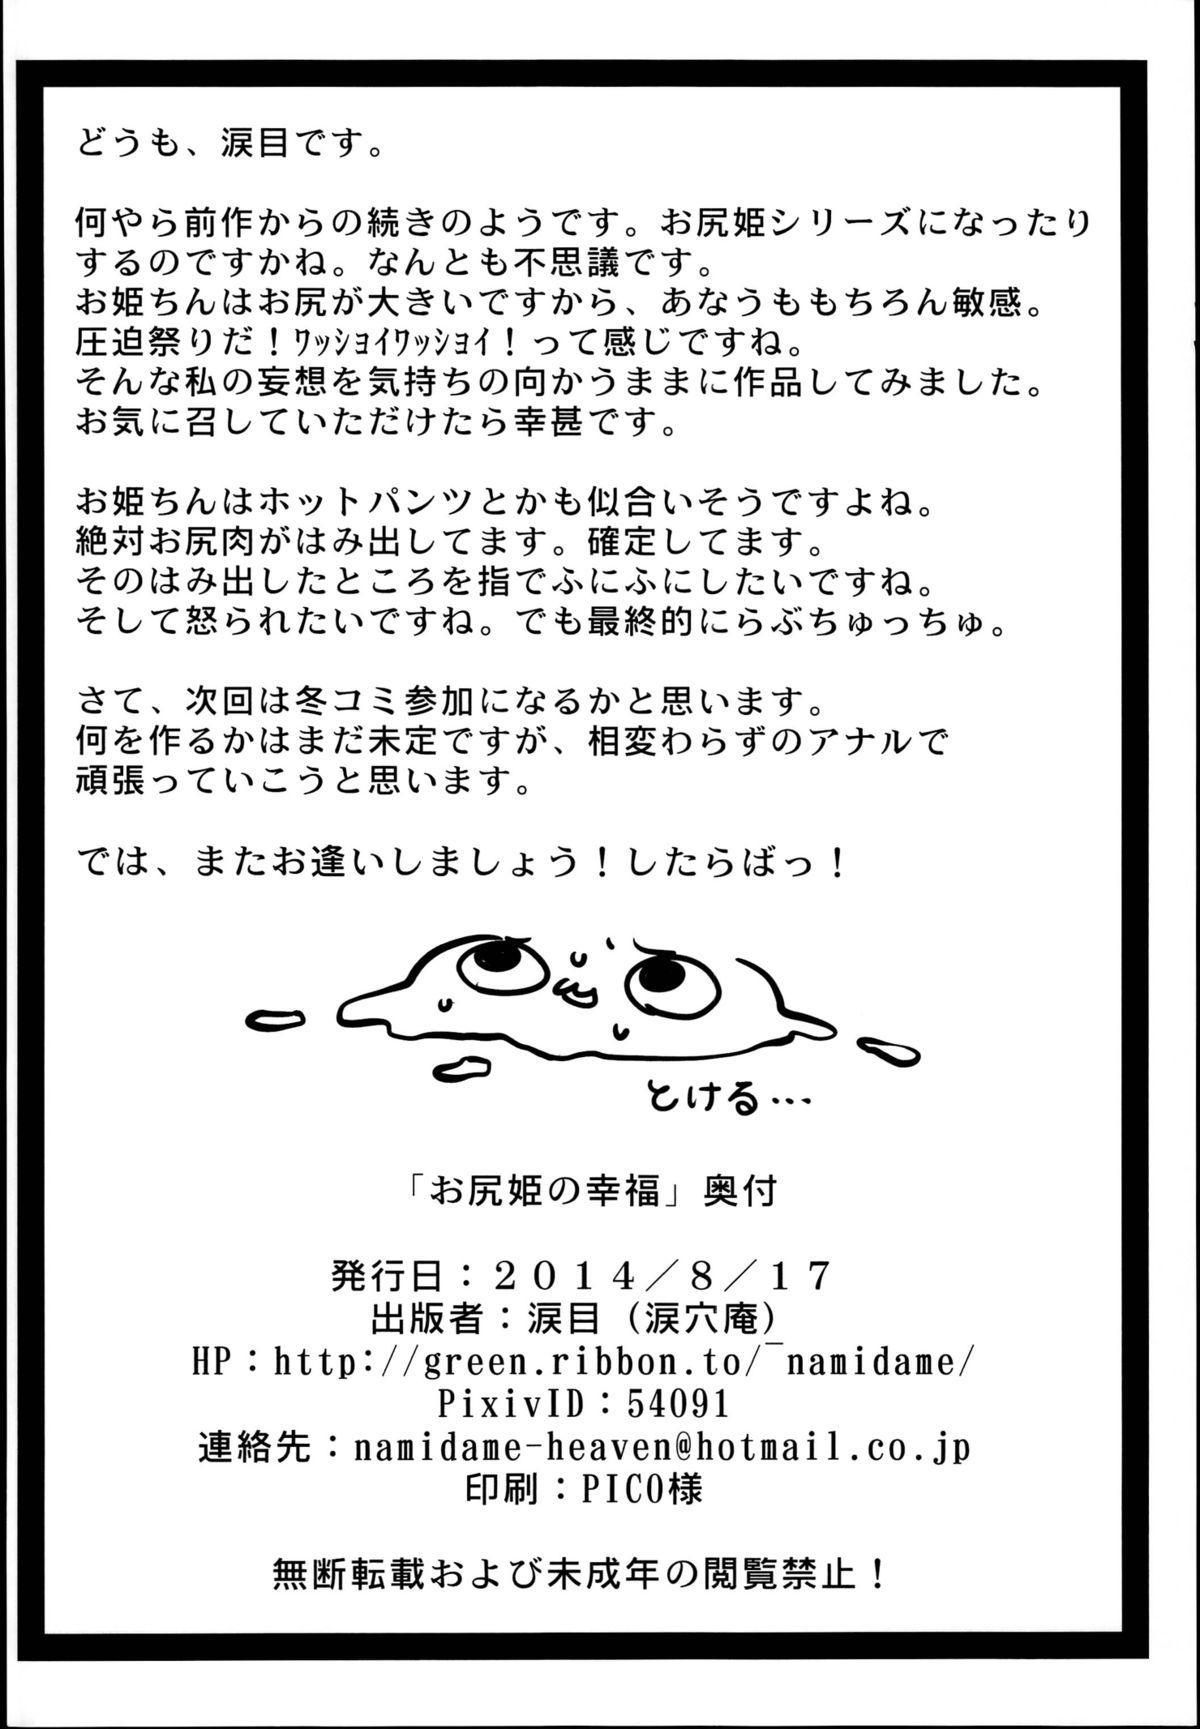 (C86) [Ruiketsuan (Namidame)] Oshiri-Hime no Koufuku   Anal-Princess's Happiness (THE iDOLM@STER) [English] [doujin-moe.us] 20